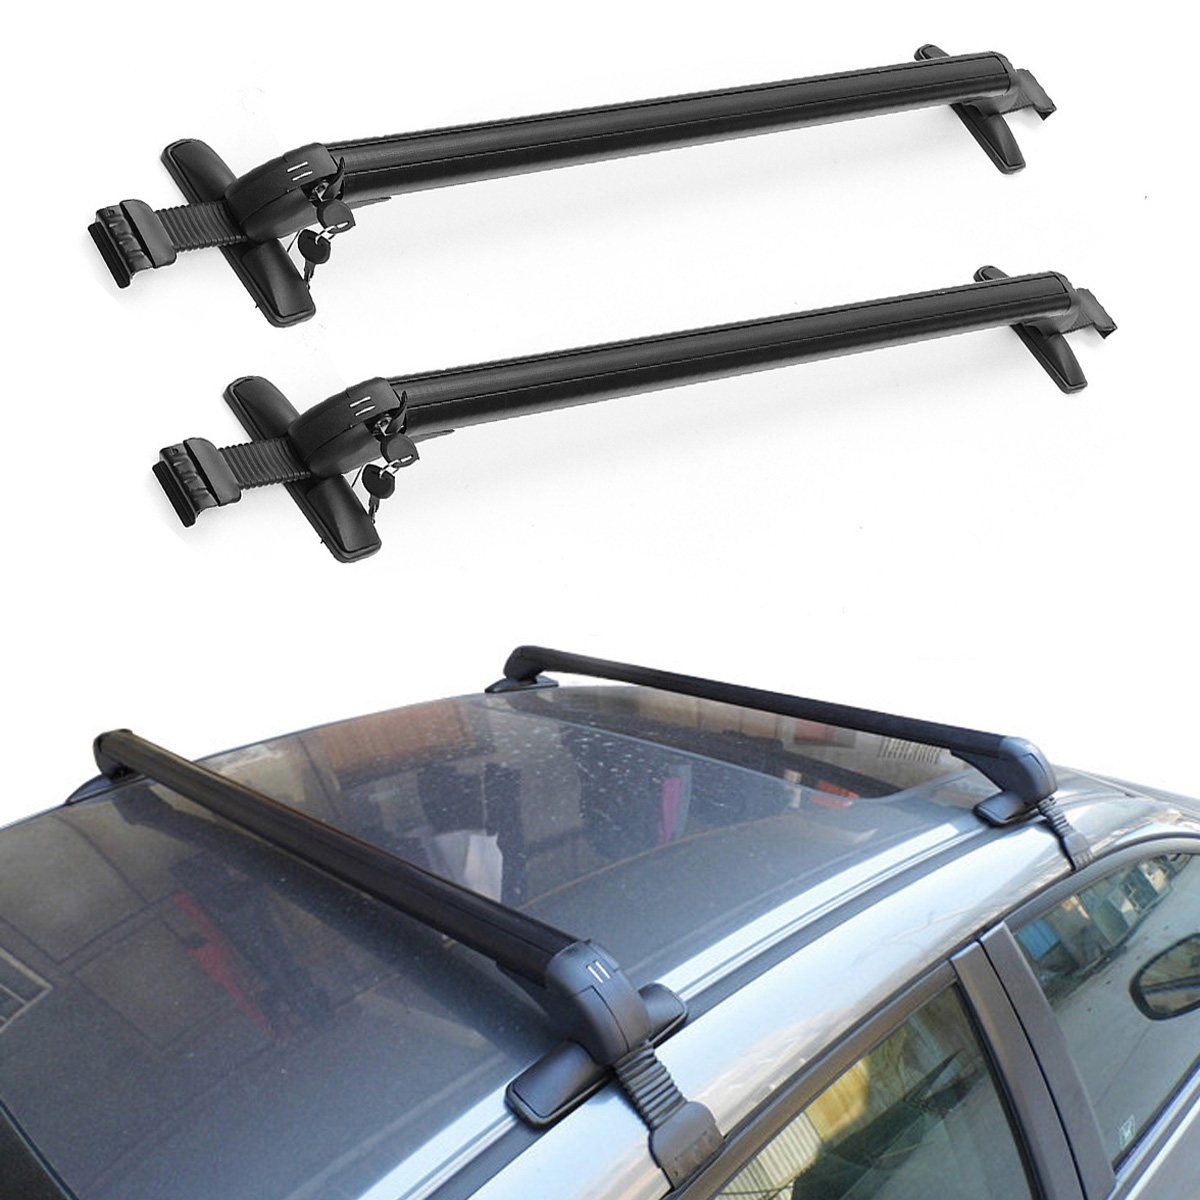 Universal car roof cross bar anti theft lockable bars roof racks with keys for cars